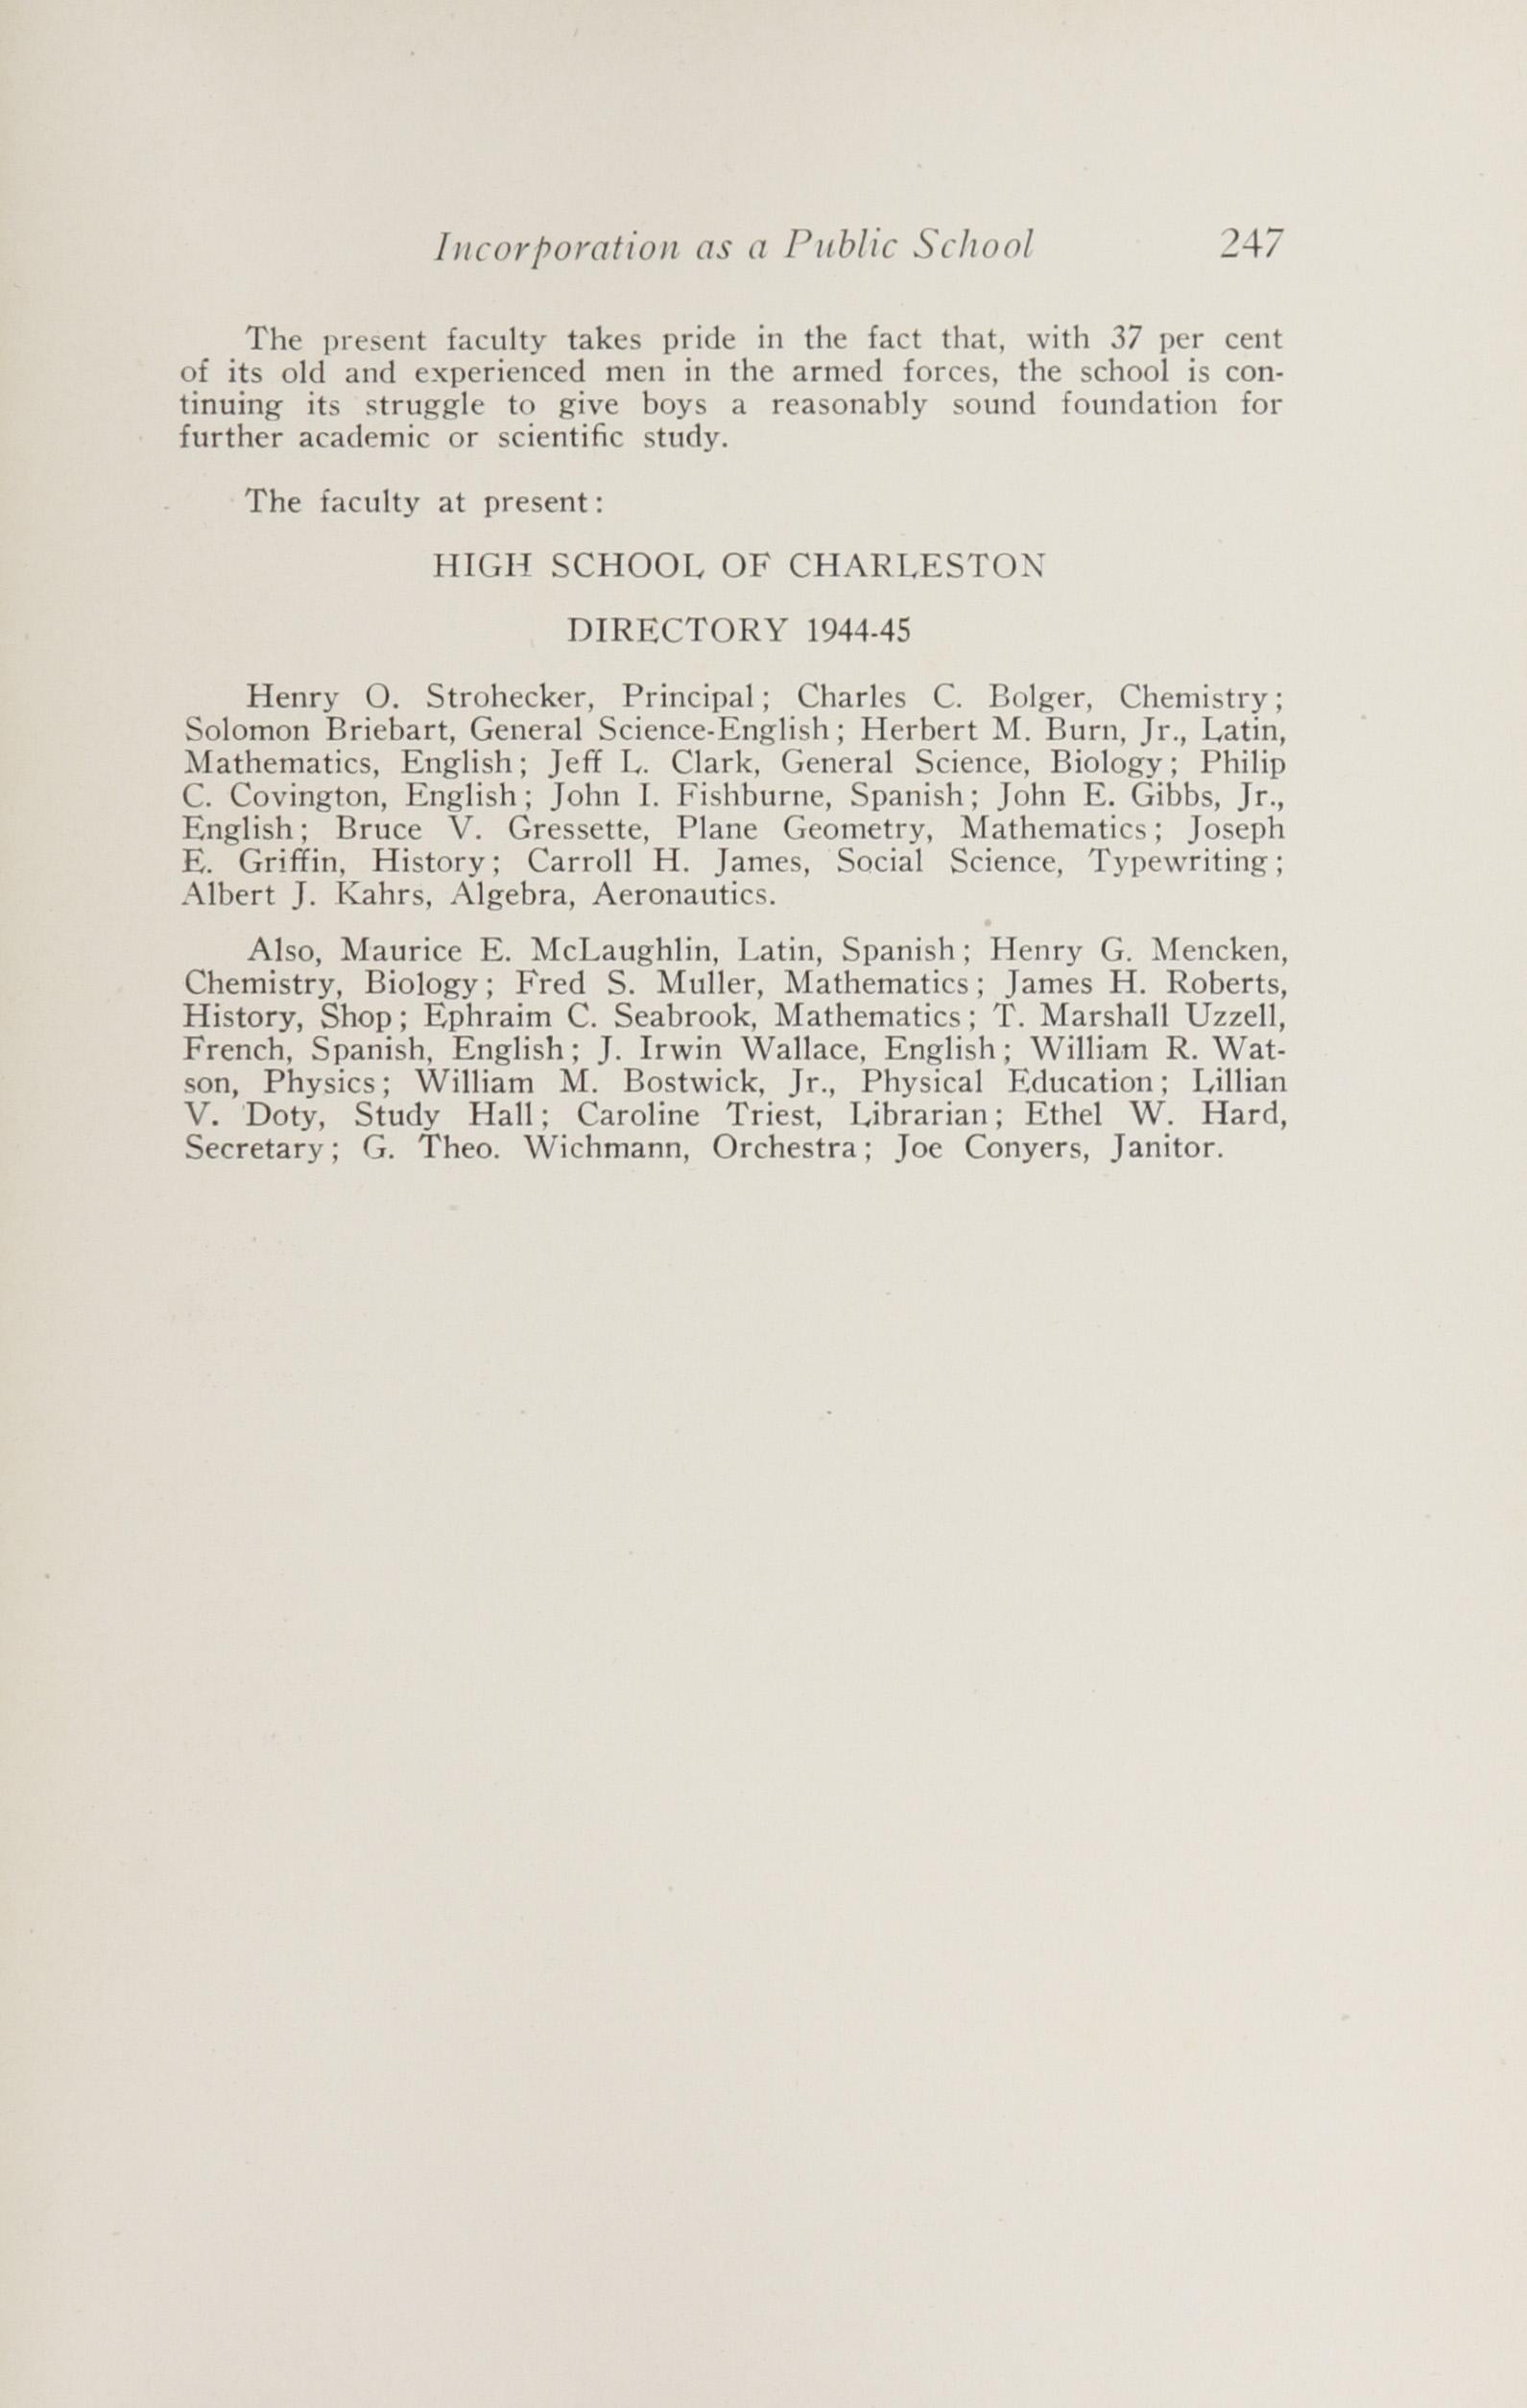 Charleston Yearbook, 1943, page 247